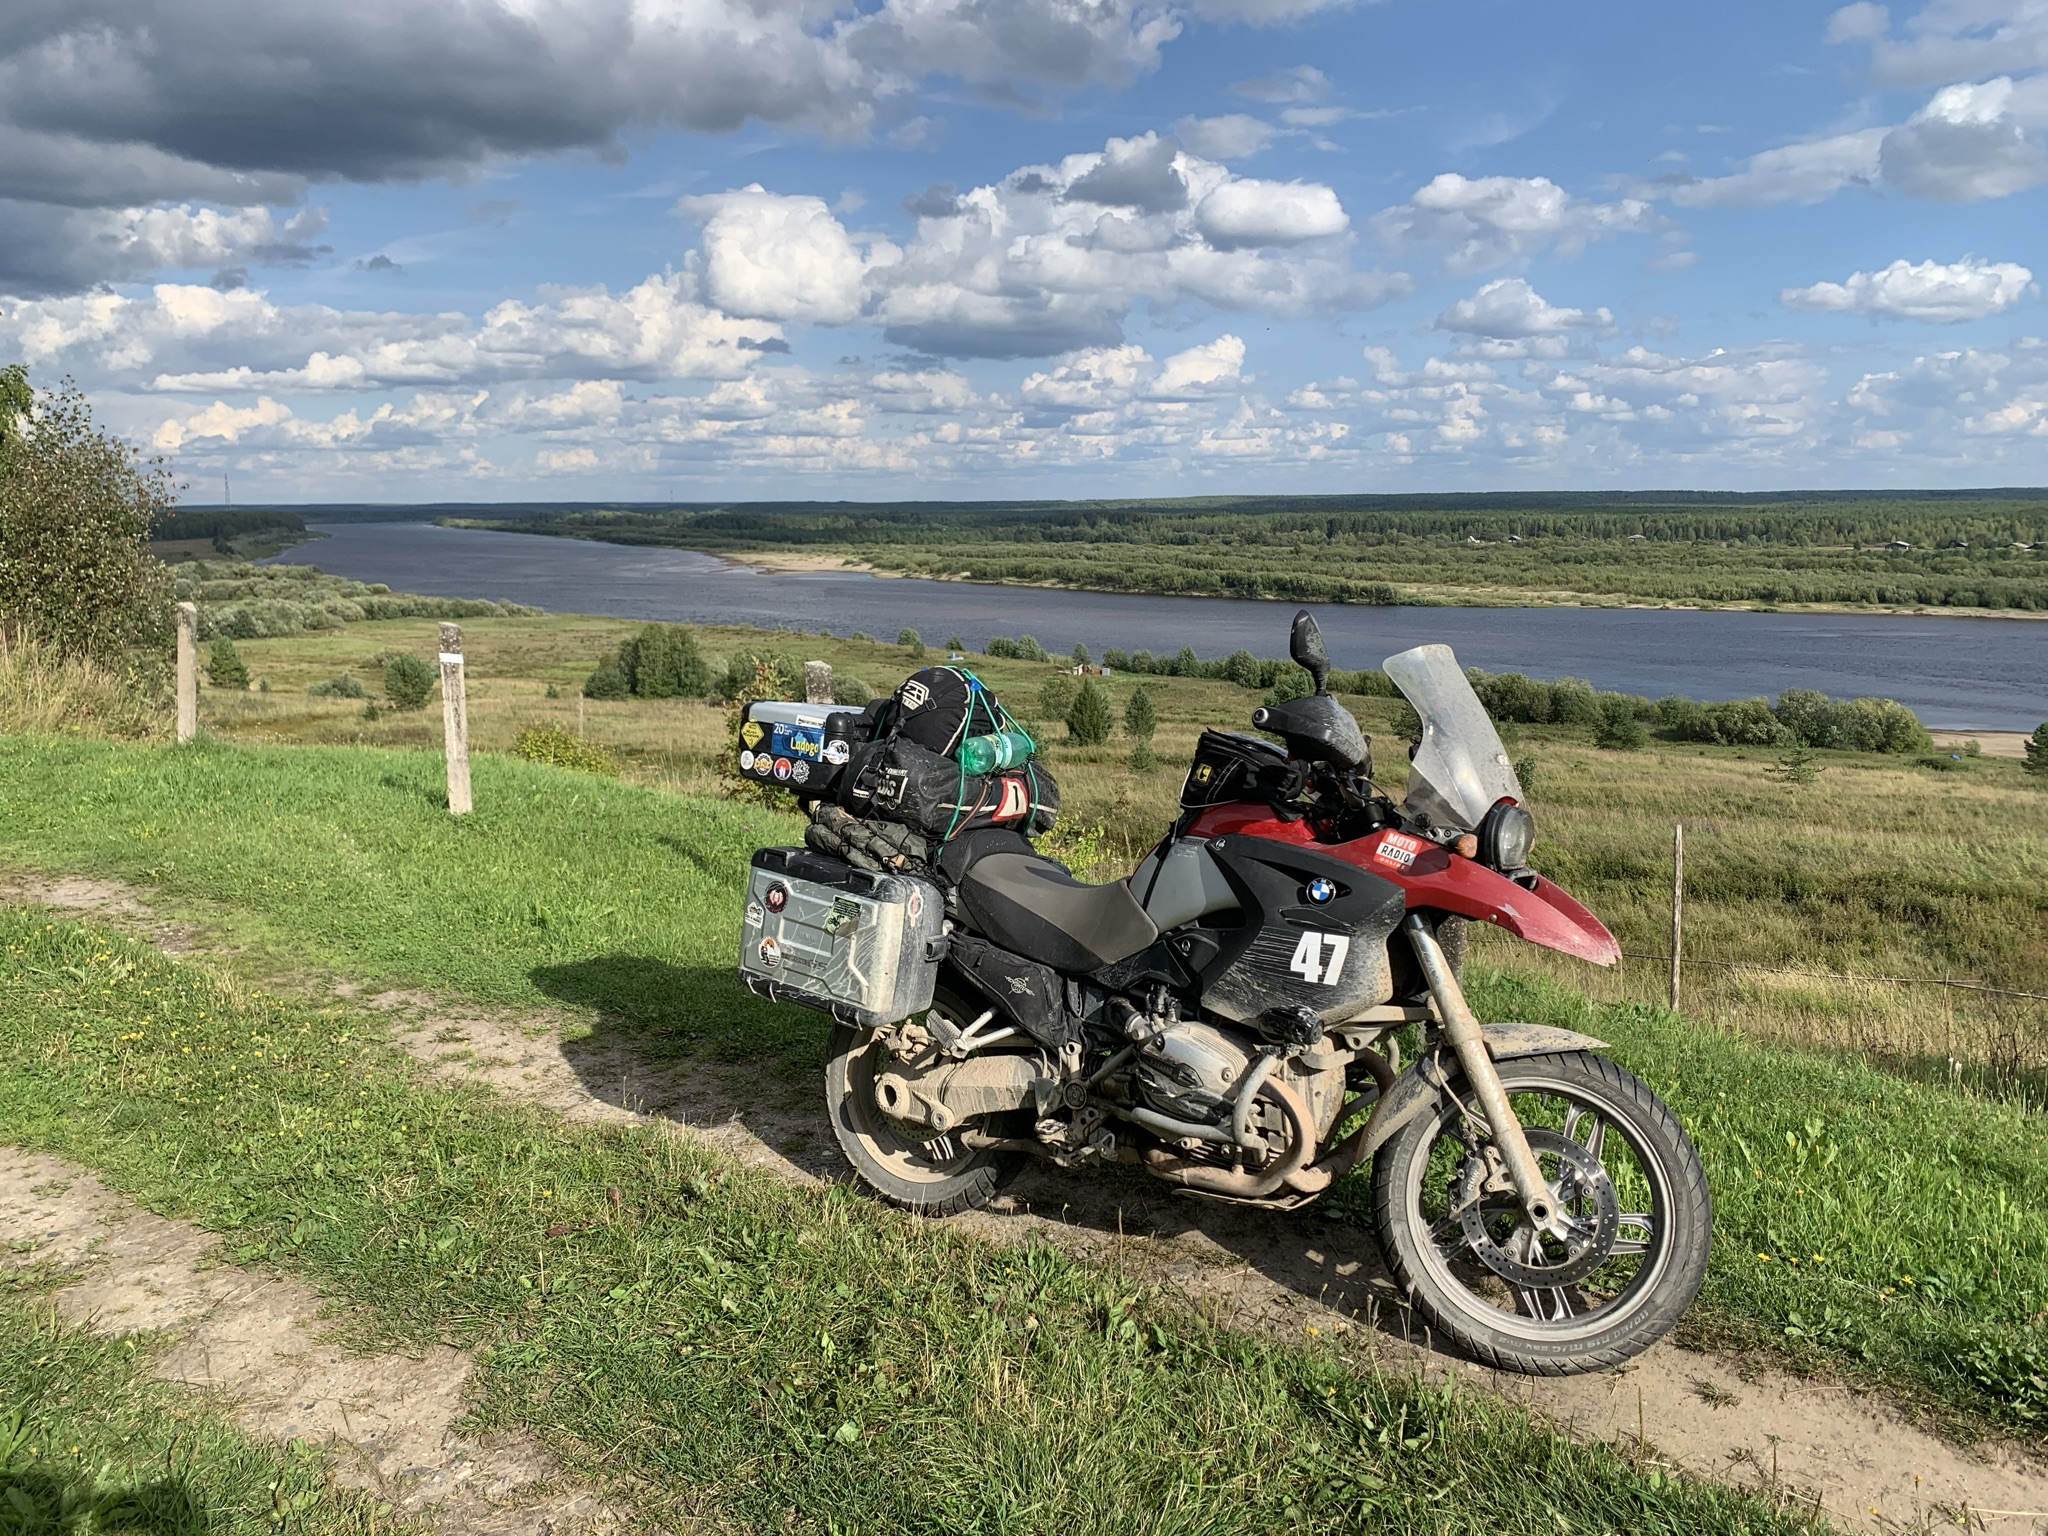 Как же без фоточки мотоцикла?